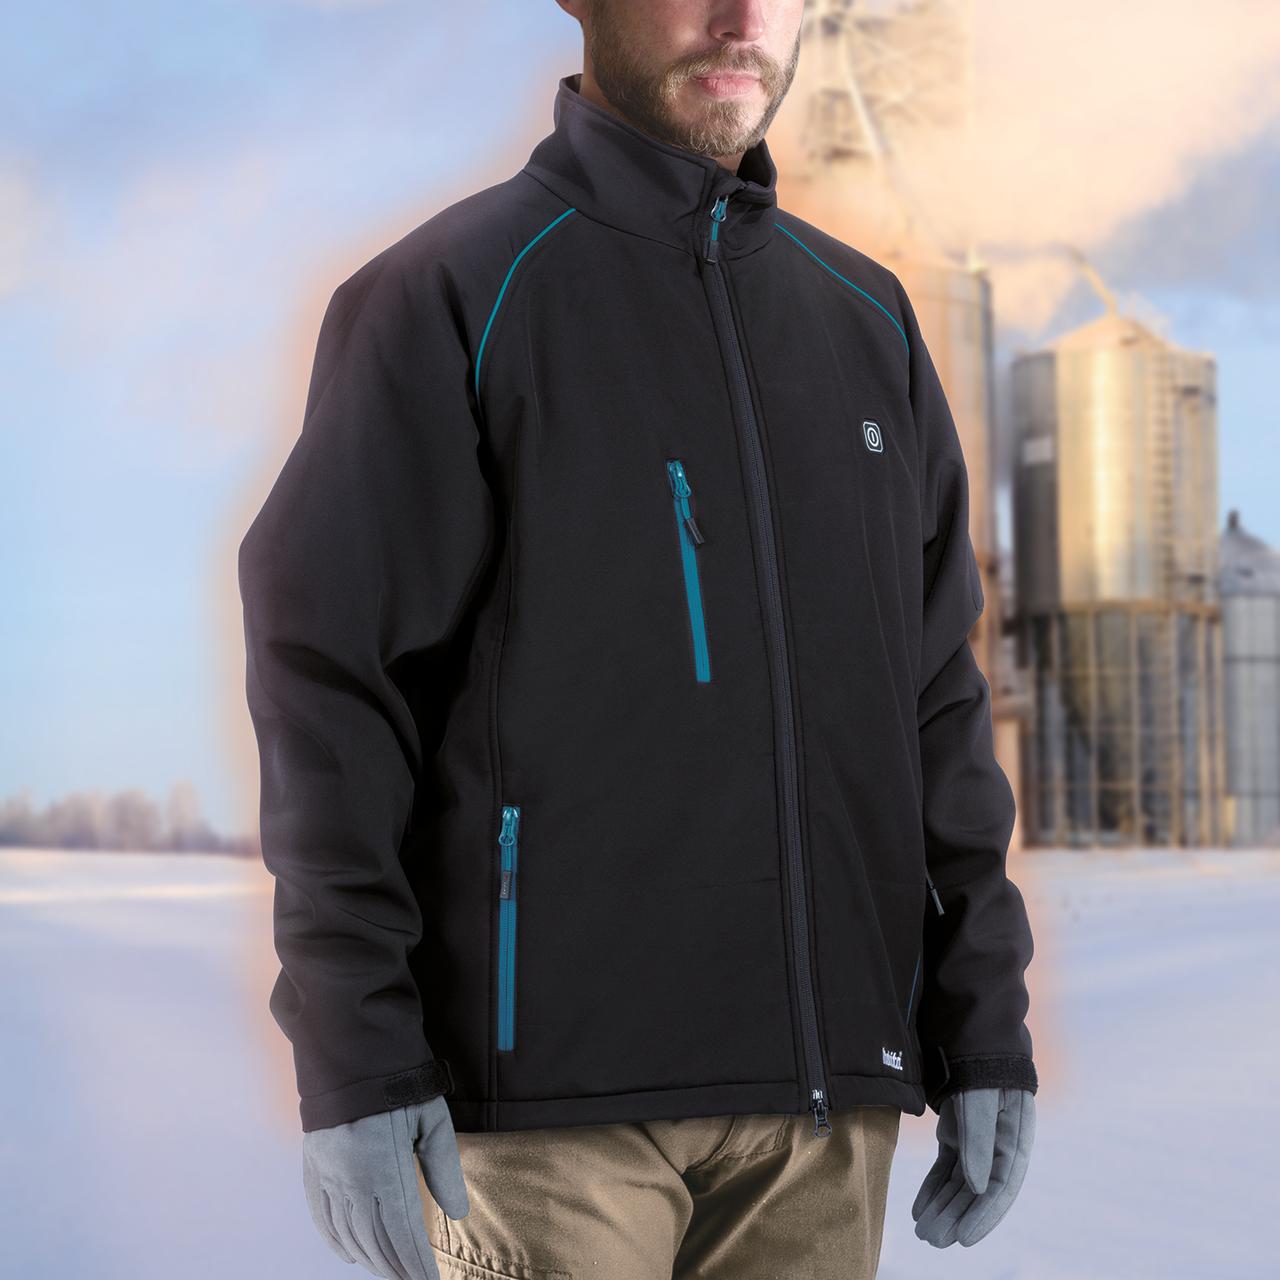 Makita DCJ205ZXXX 14.4/18V LXT Lithium-Ion Cordless Heated Jacket (Jacket Only)